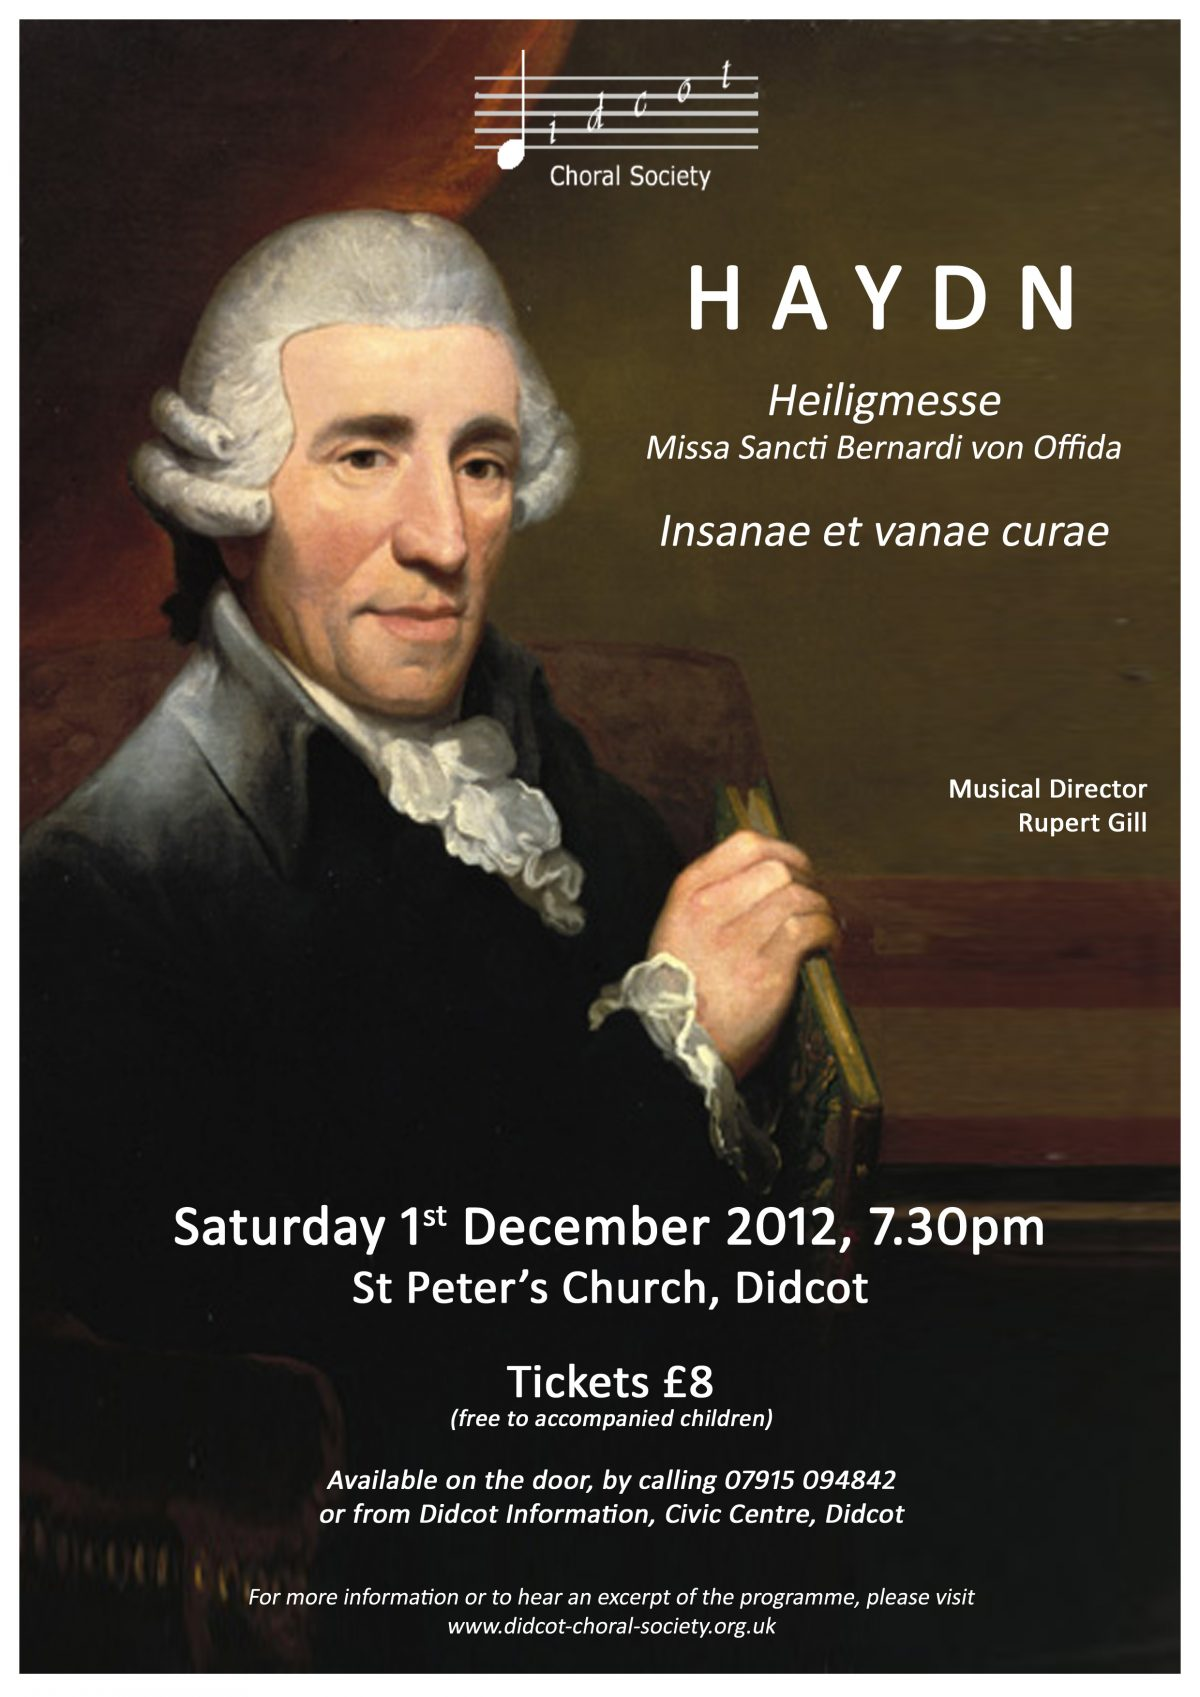 Haydn Heiligmesse December 2012